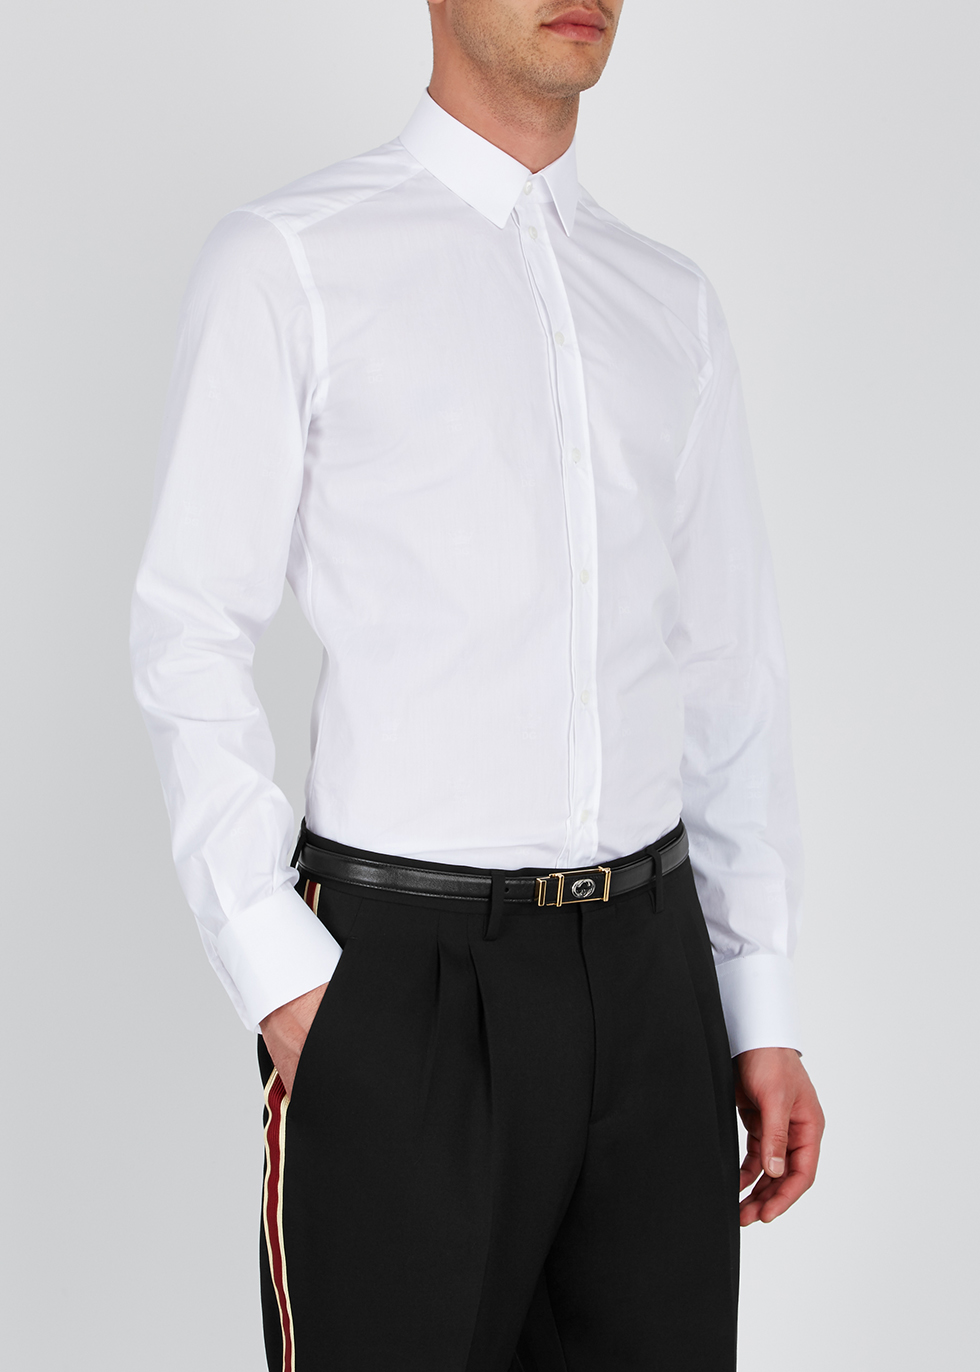 GG black leather belt - Gucci